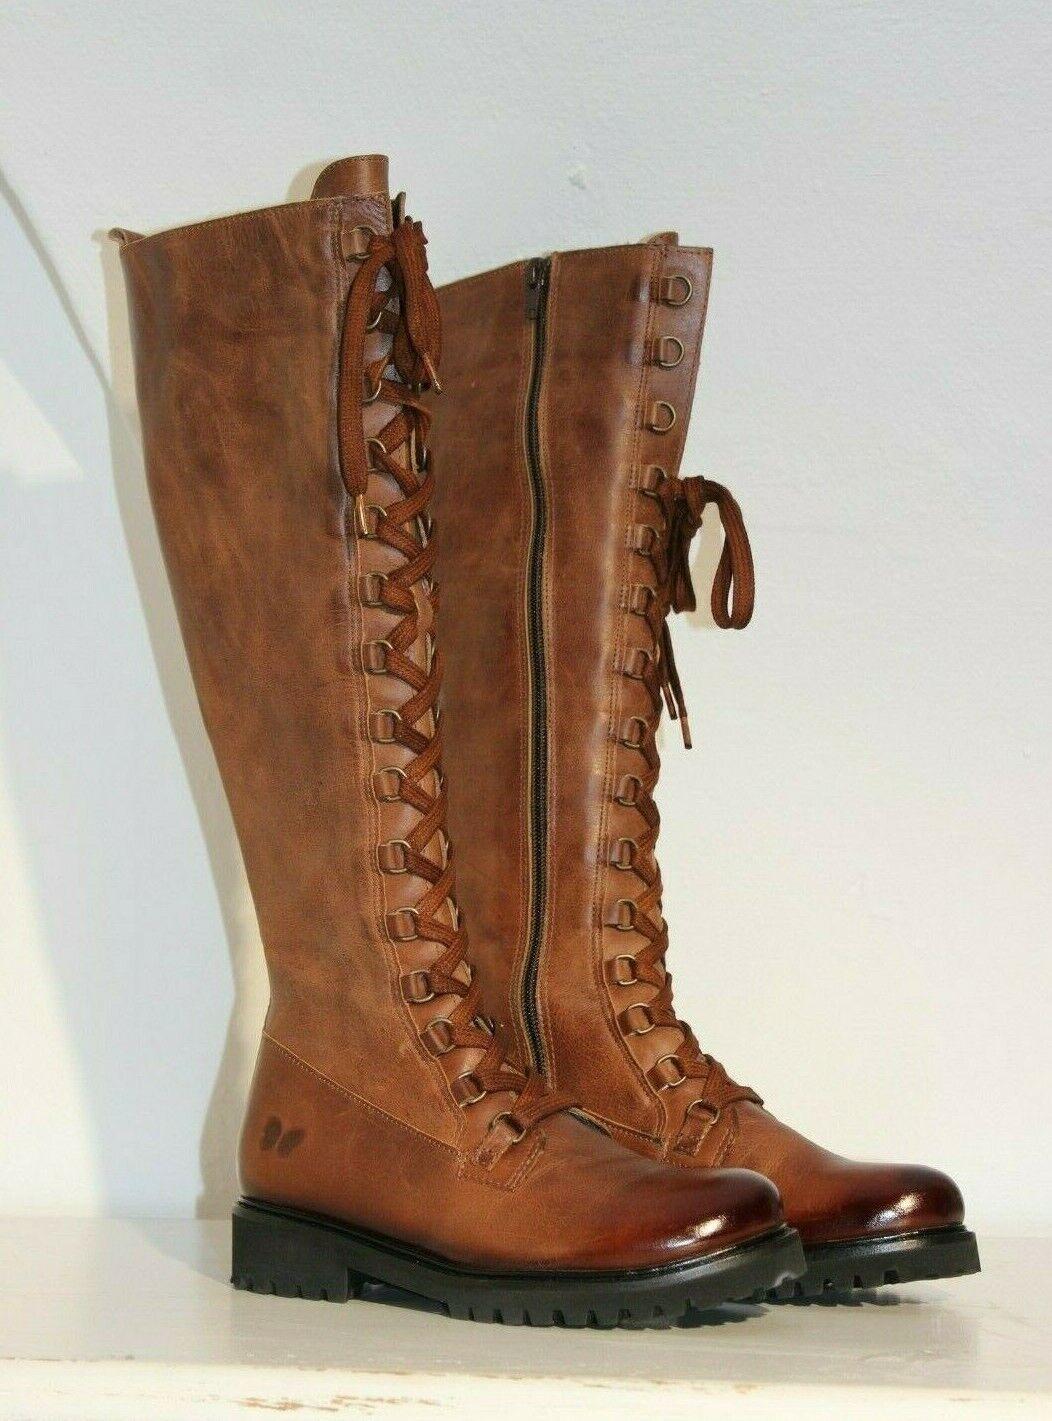 Felmini NEU Leder-Schnür-Stiefel Gr.39 Cognac-Braun Uraco Santiago